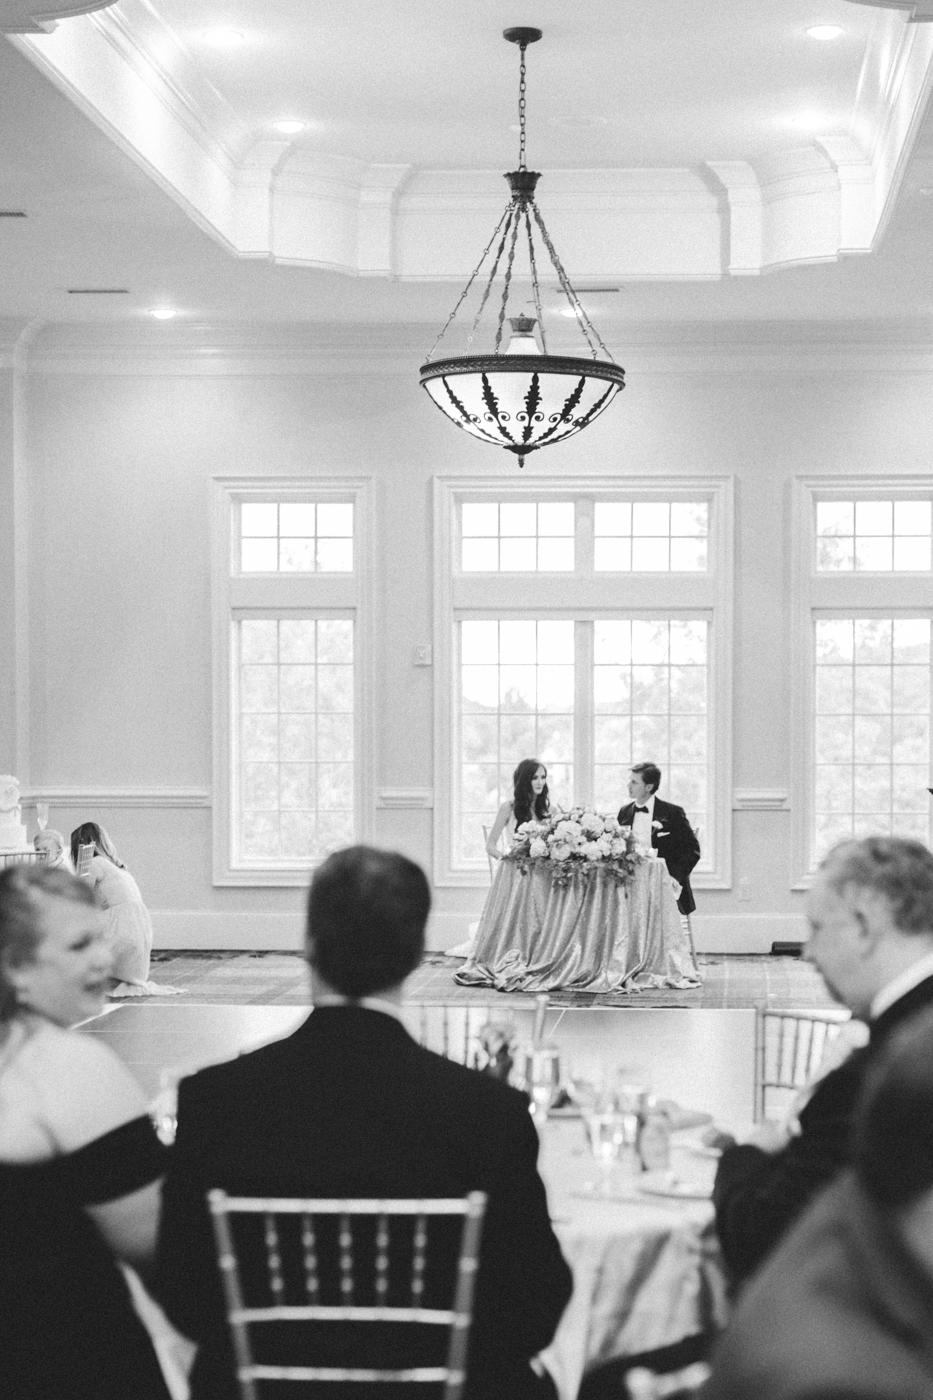 four corners photography best atlanta wedding photographer the manor golf and country club wedding photos southern weddings bride magazine wedding photos atlanta photographer-43.jpg